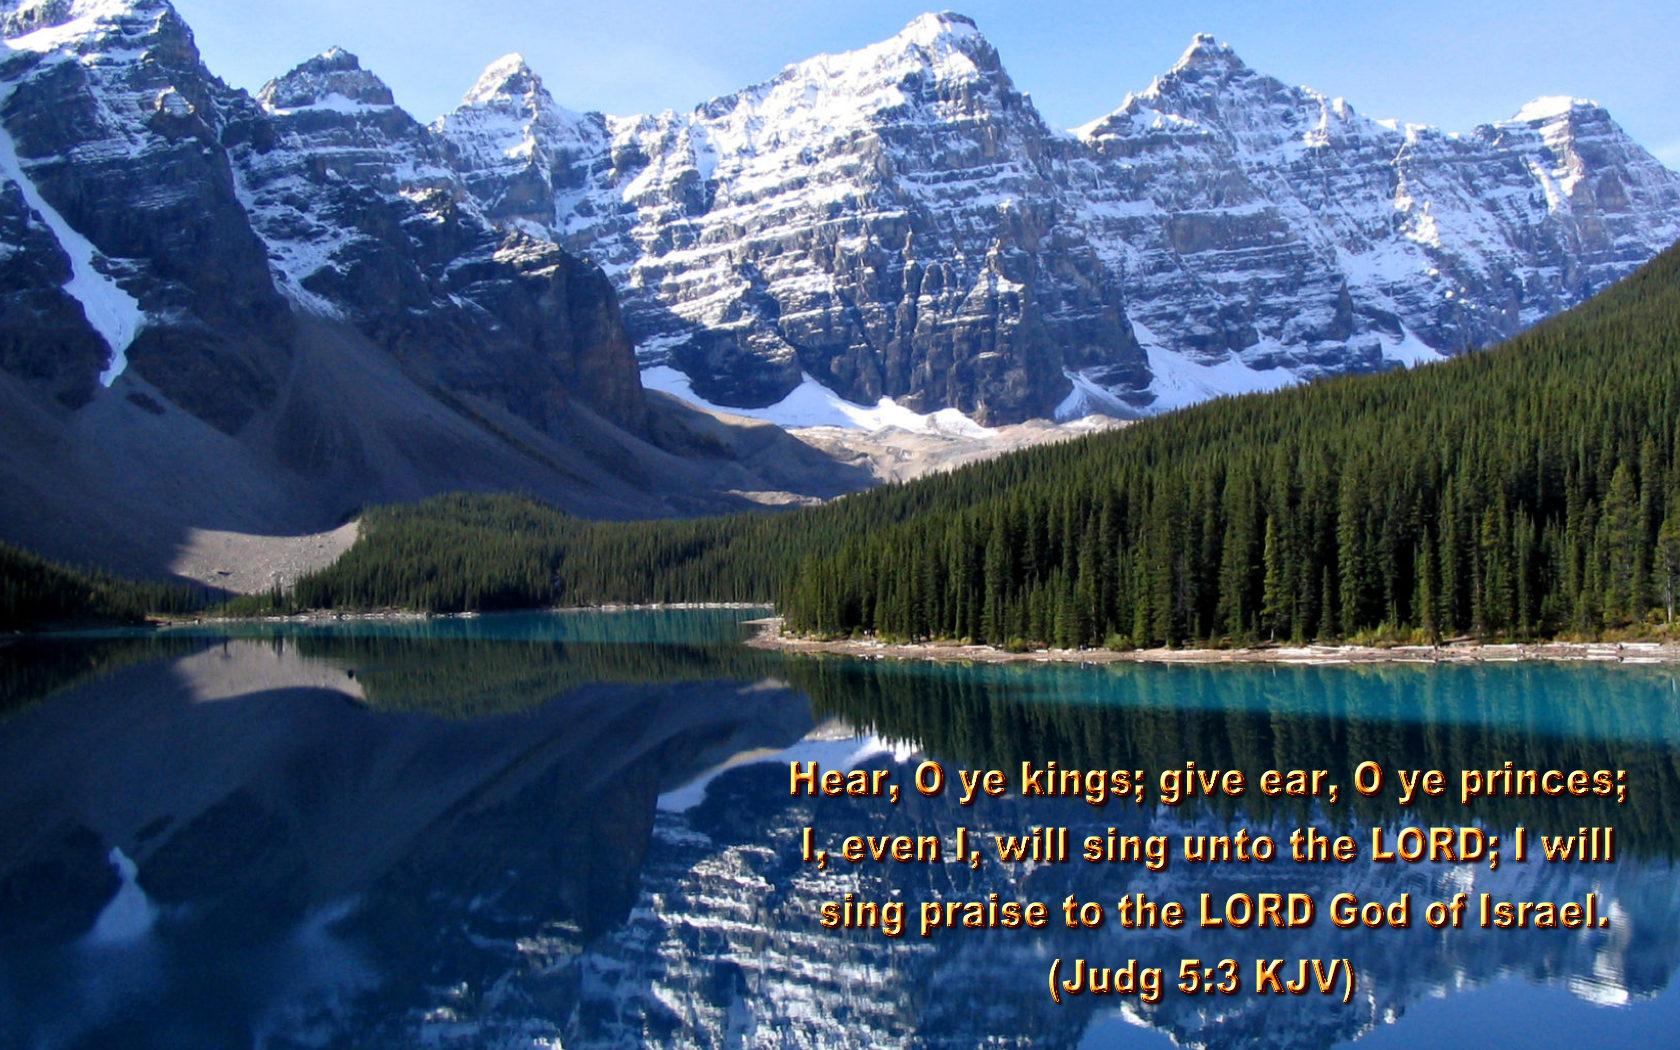 Bible Verses Wallpaper Home Design 1680x1050